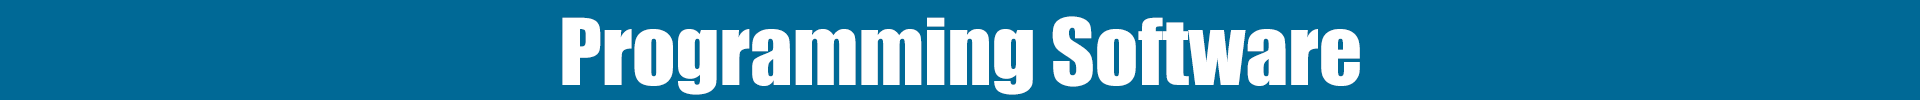 programming-software3.png